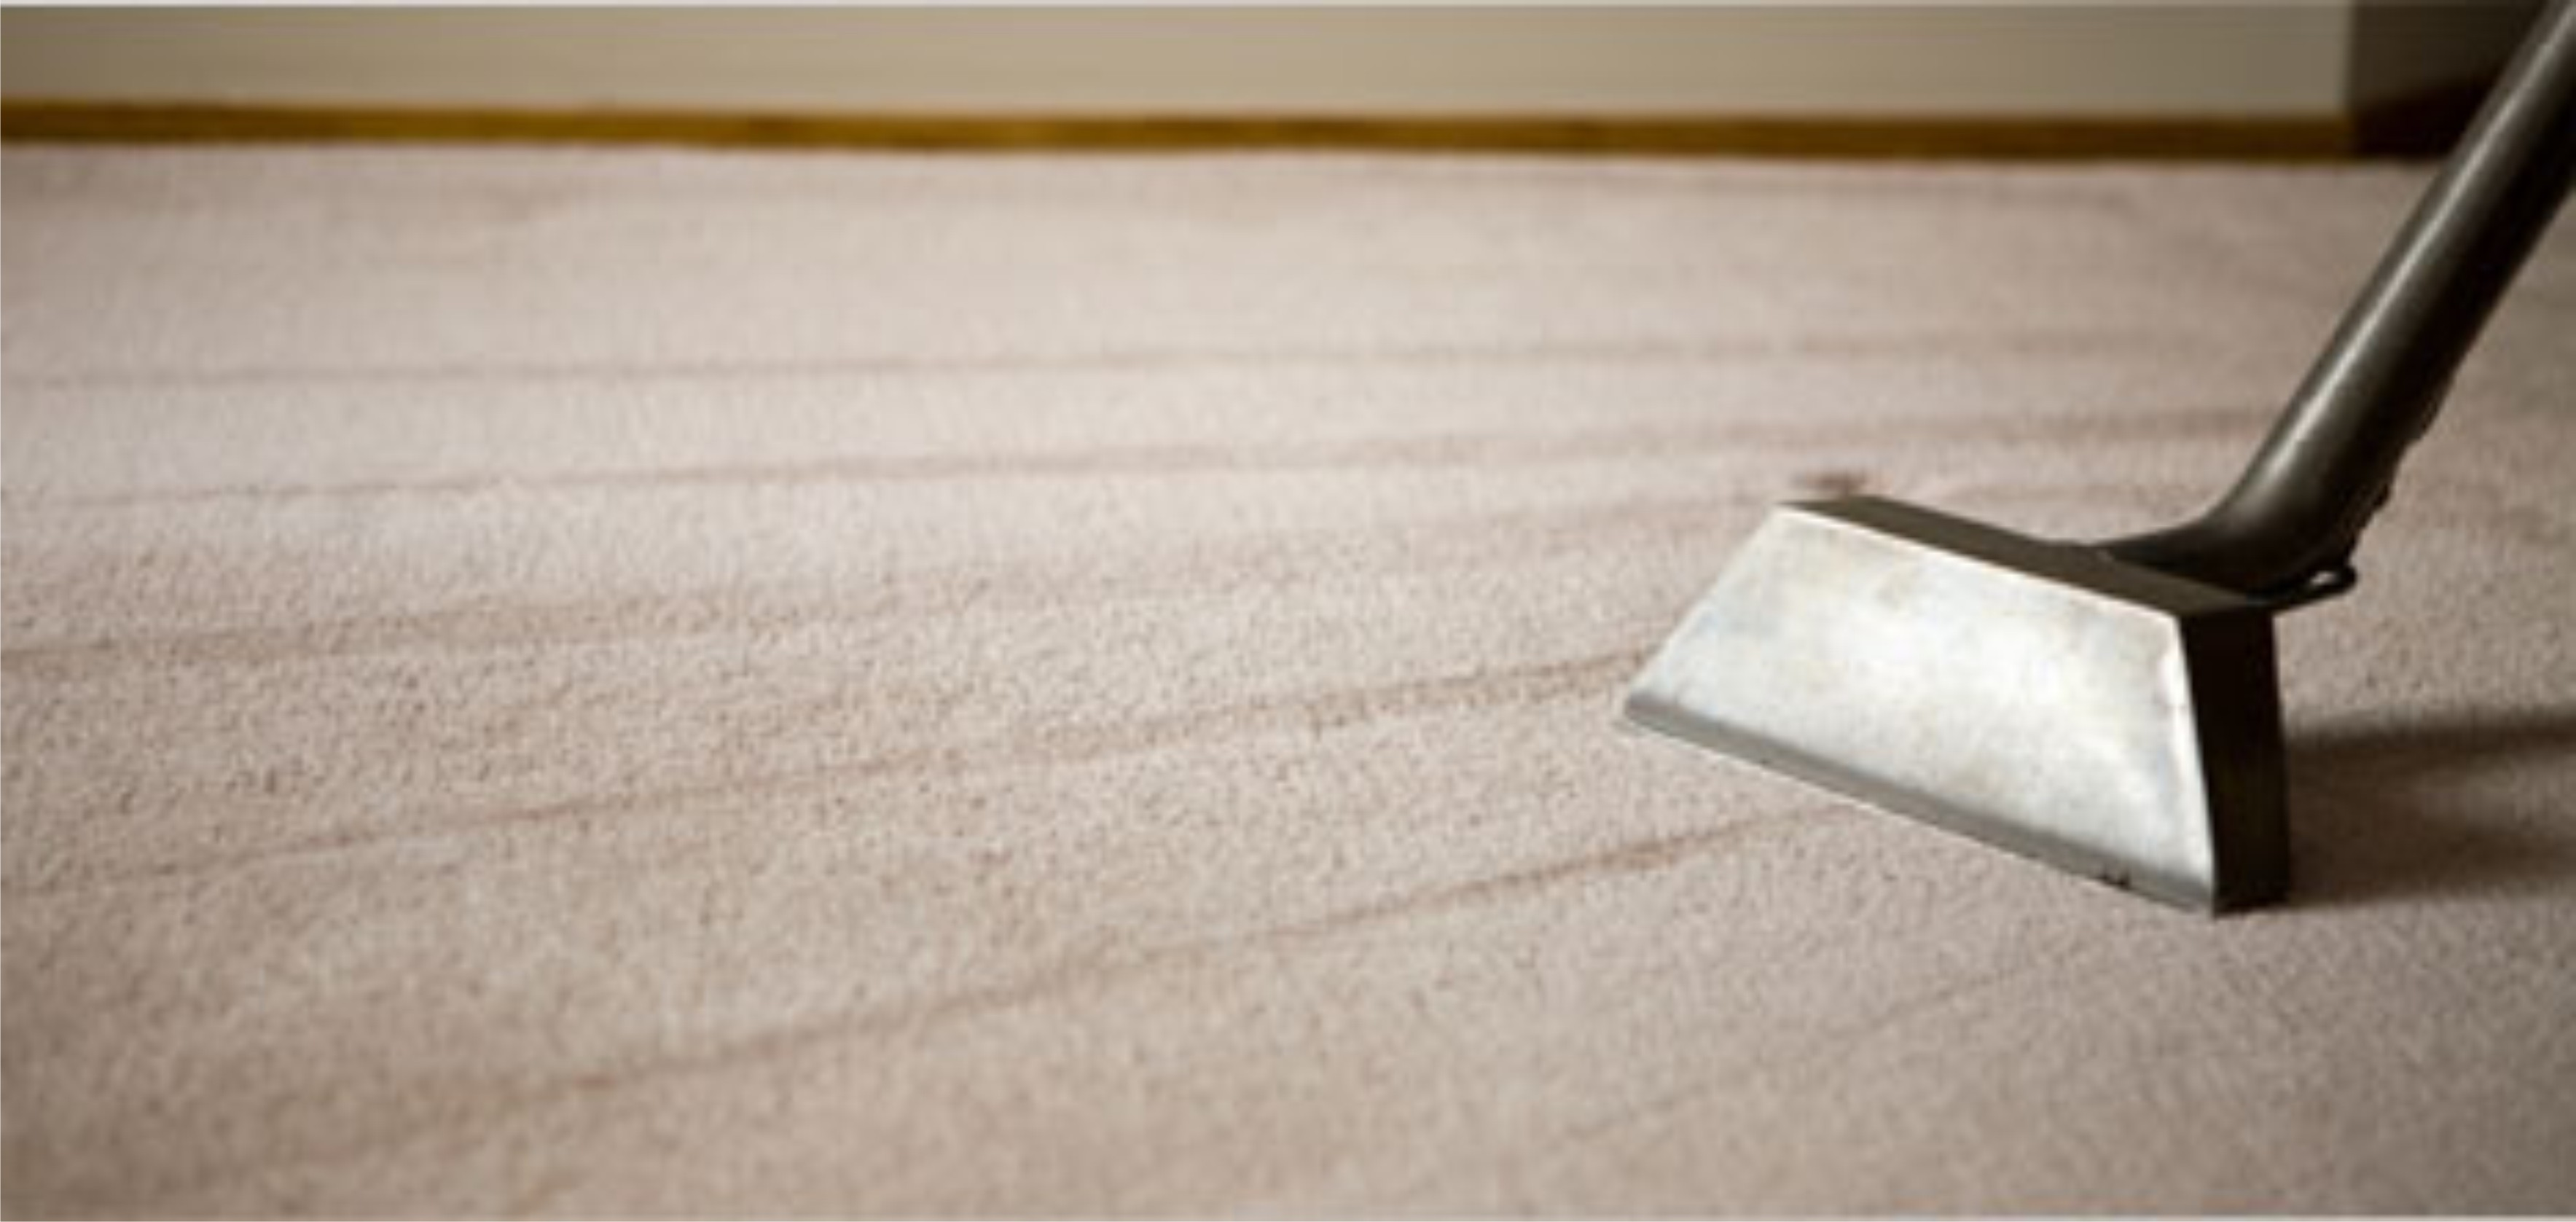 Save Money Buying A Carpet Steam Cleaner Steam Clean